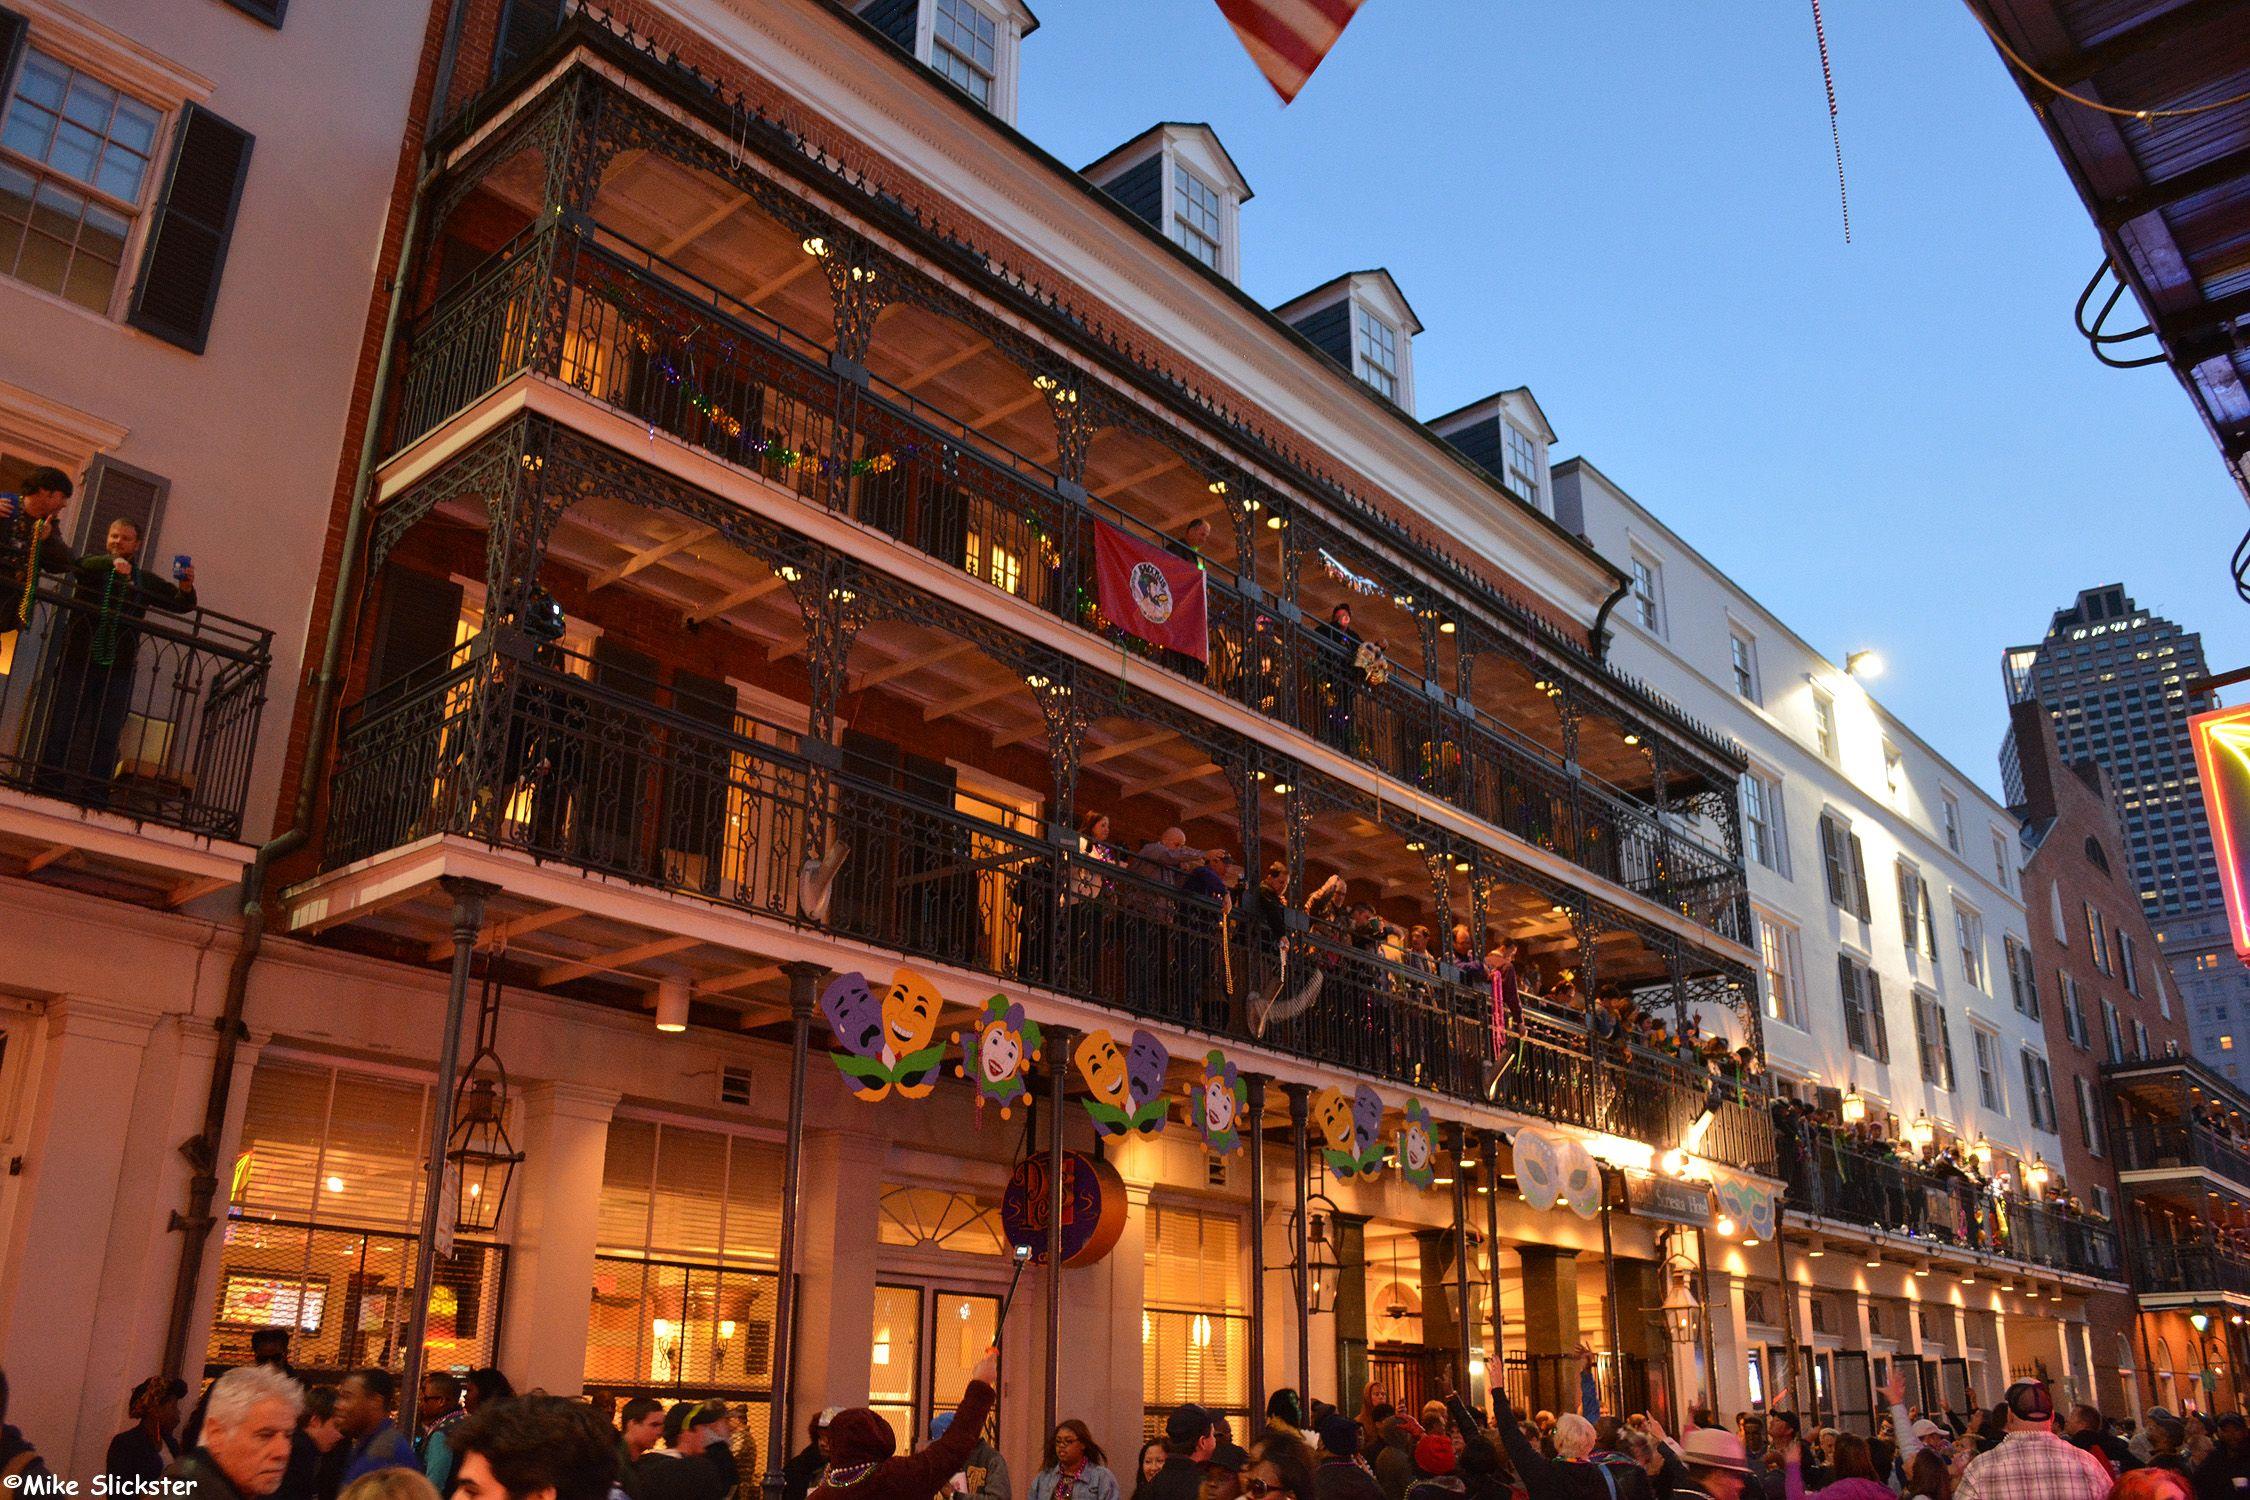 More Revelers On The Balconies Of Magnanimous Royal Sonesta Hotel Bourbon Street Lundi